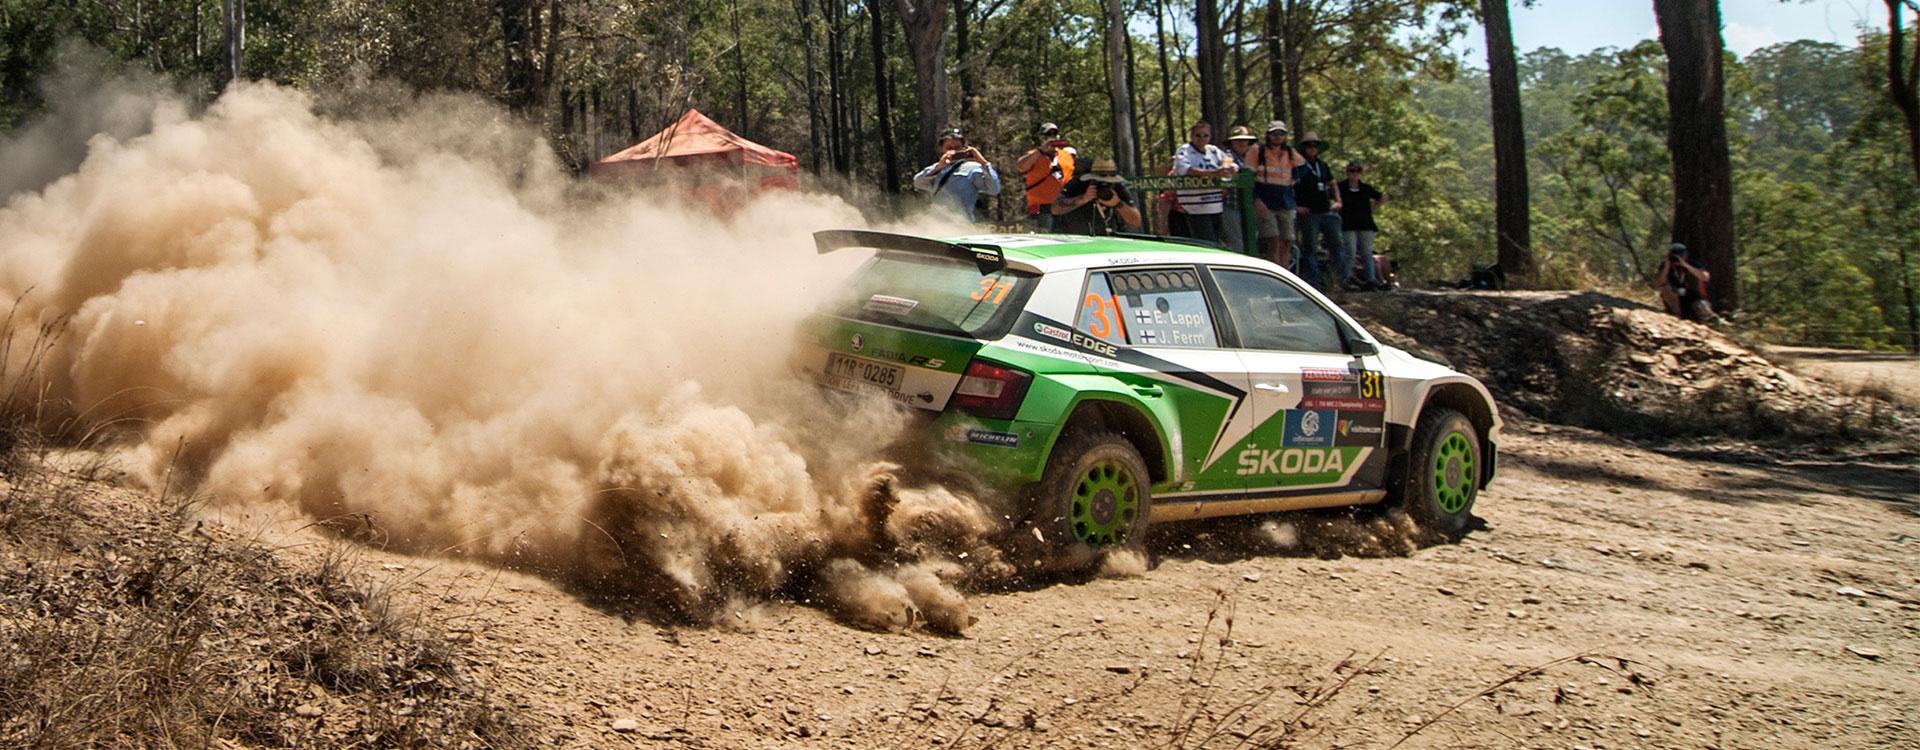 VIDEO: ŠKODA Motorsport at the Rally Australia 2016